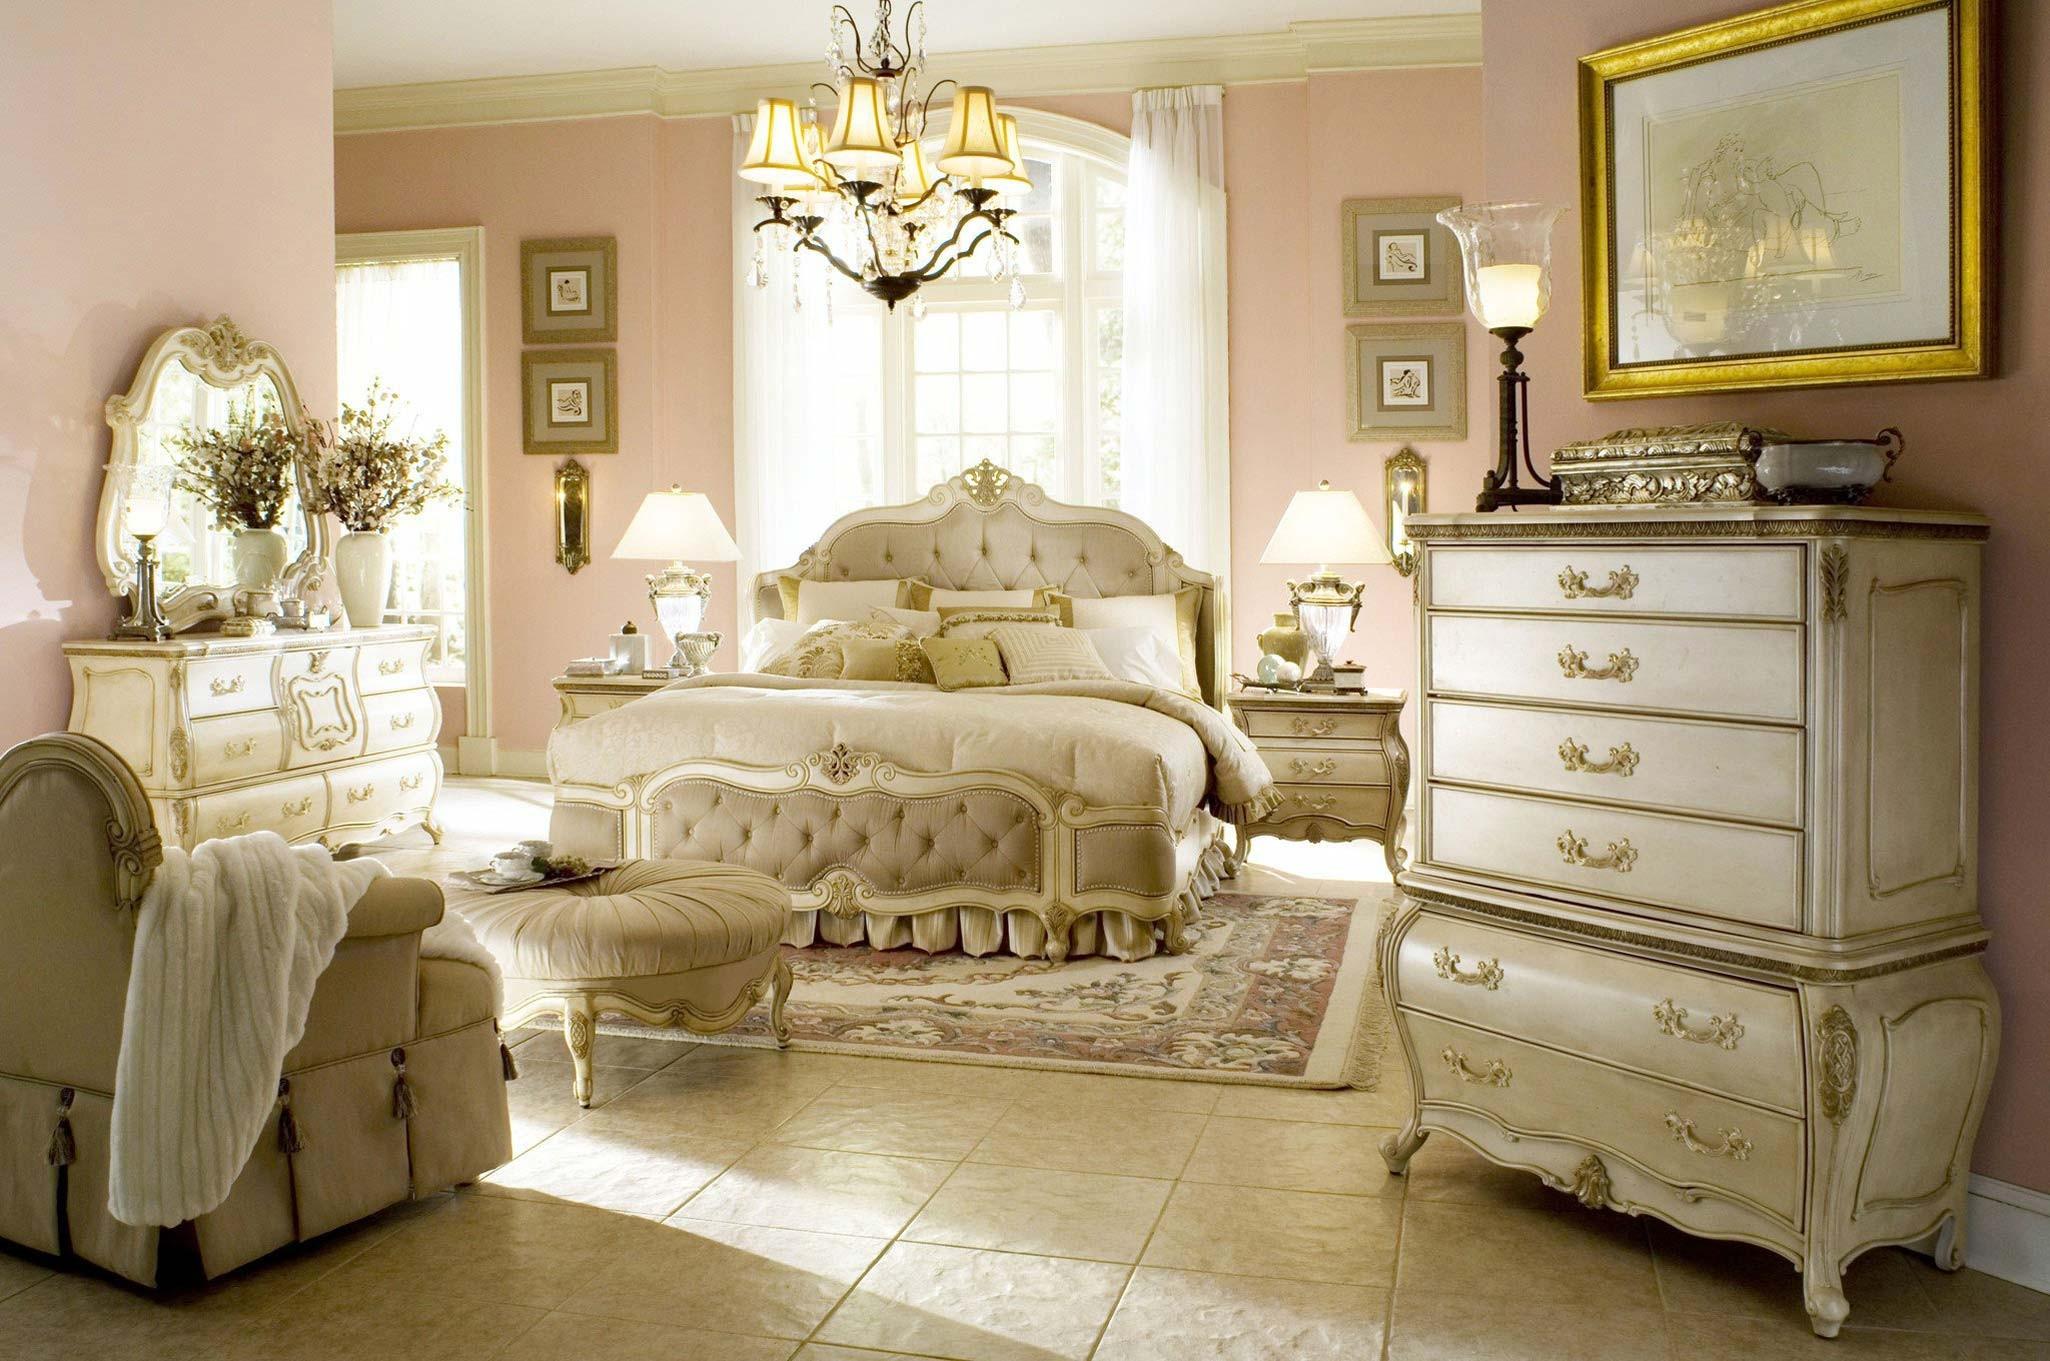 AICO Furniture Lavelle Bedroom Set in Blanc Finish